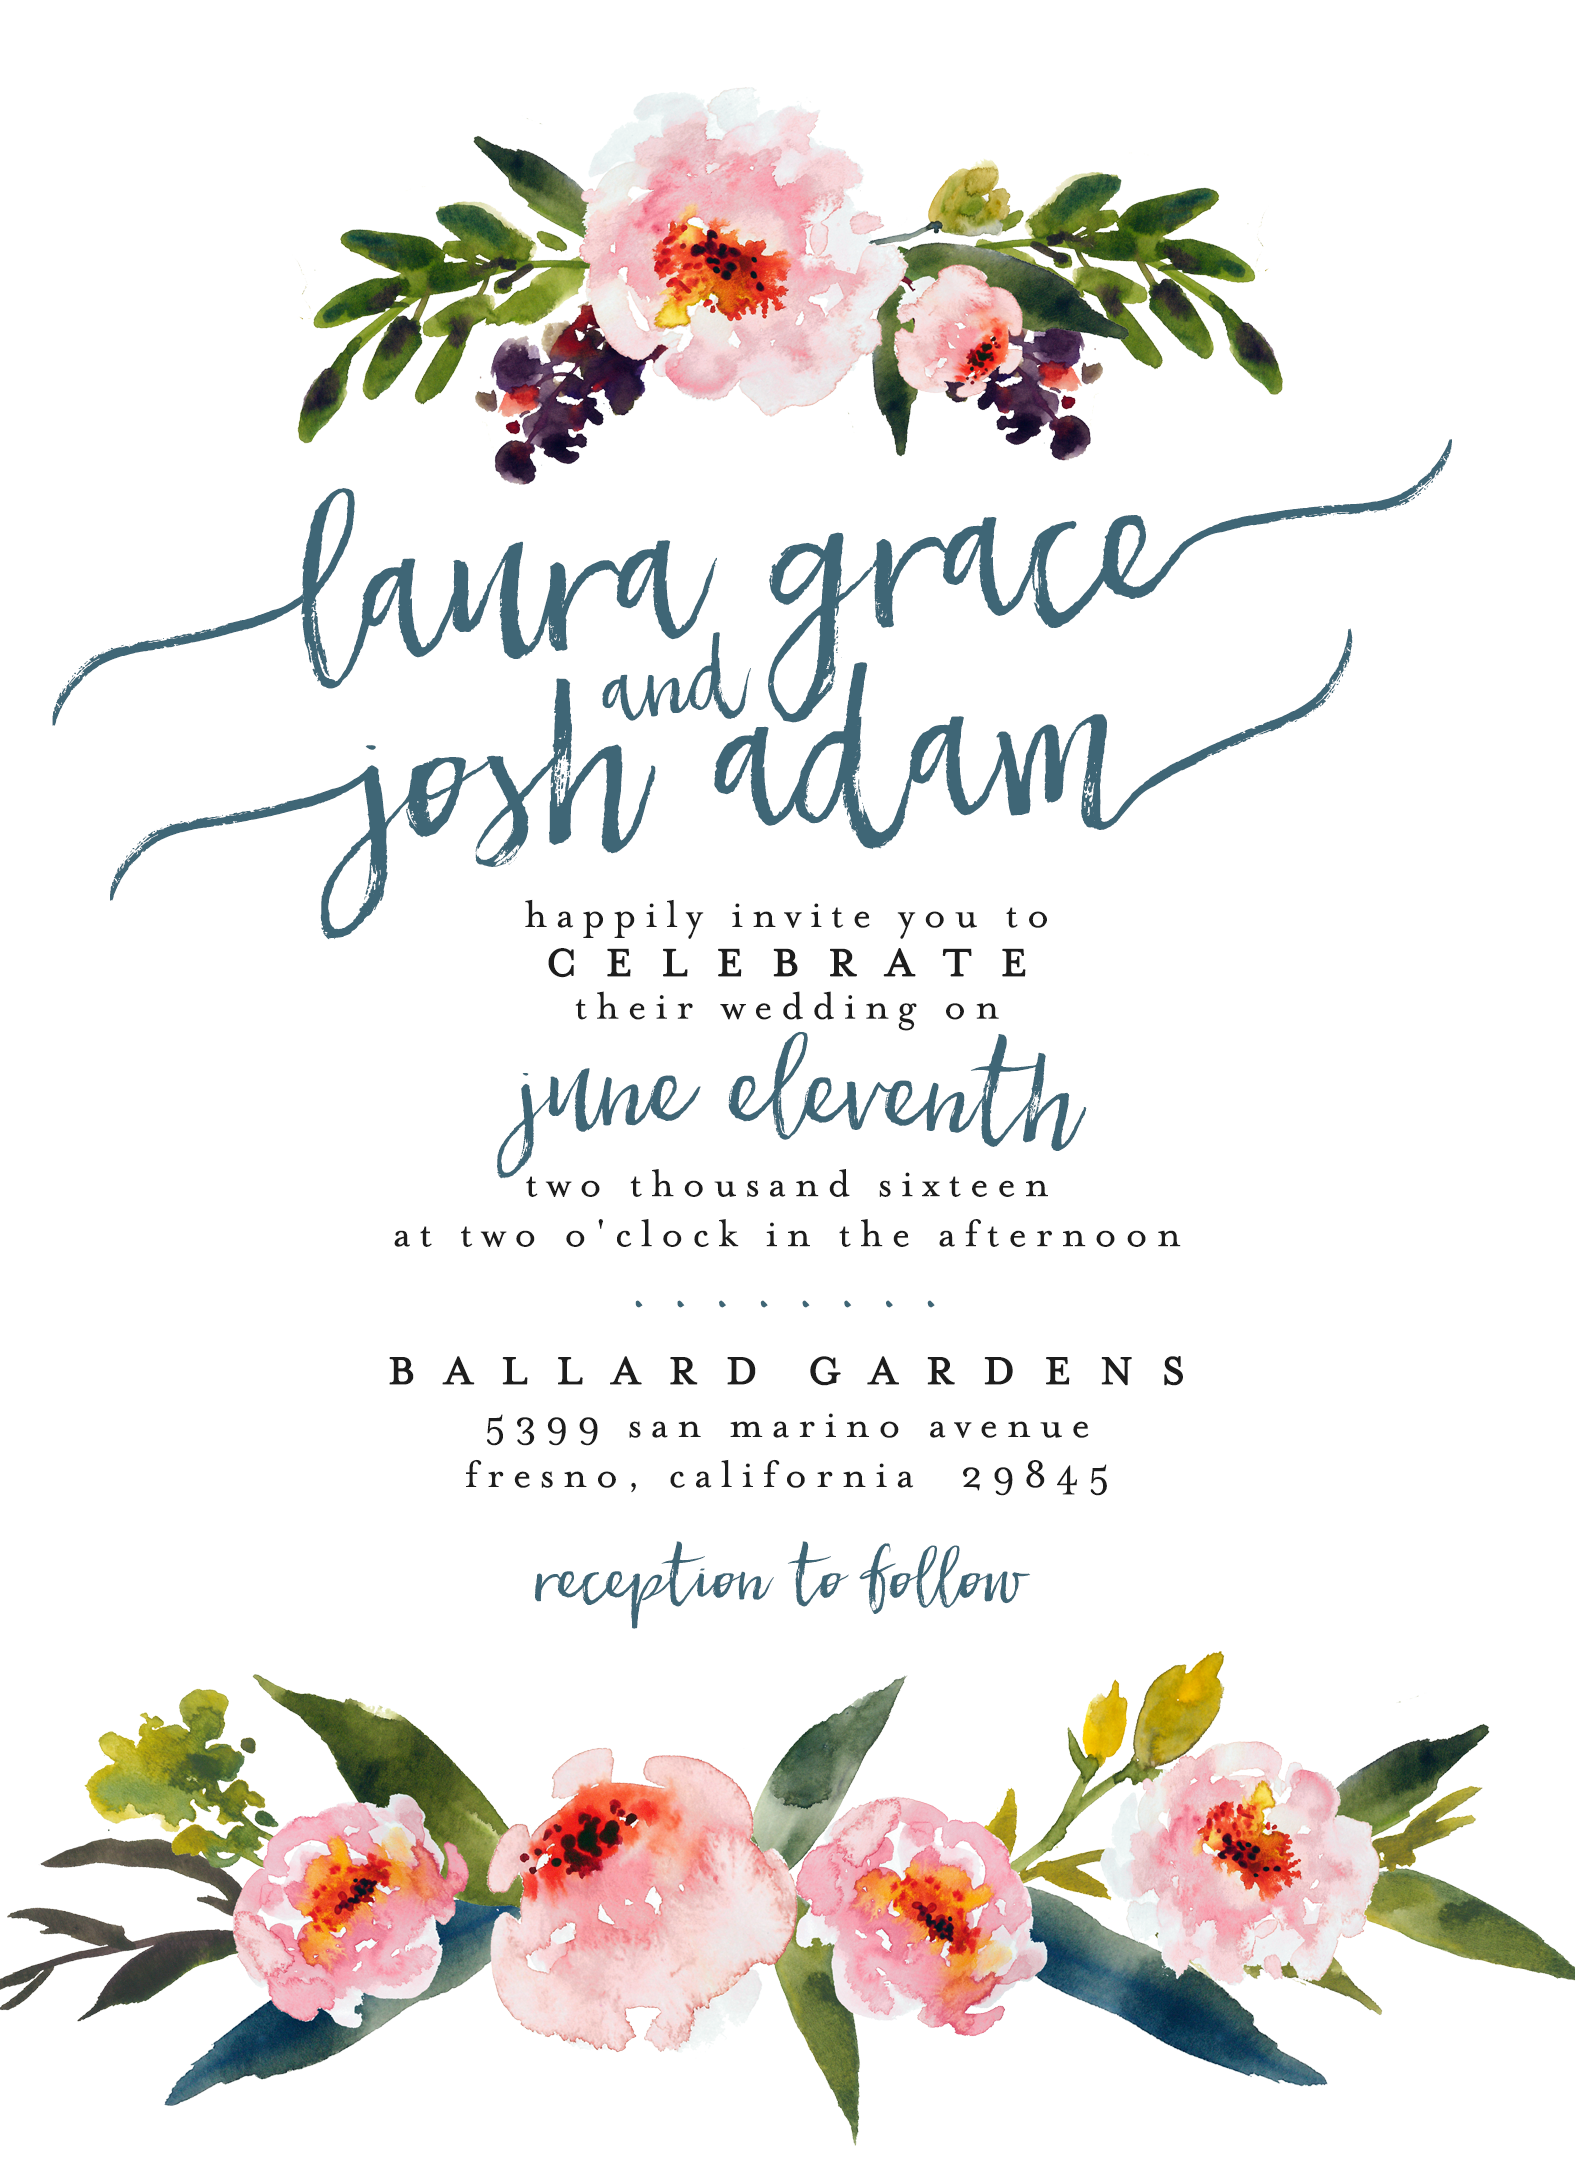 watercolor floral wedding invitation  u2215 u2215 printable  custom  diy wedding  u2215 u2215 boho chic invite